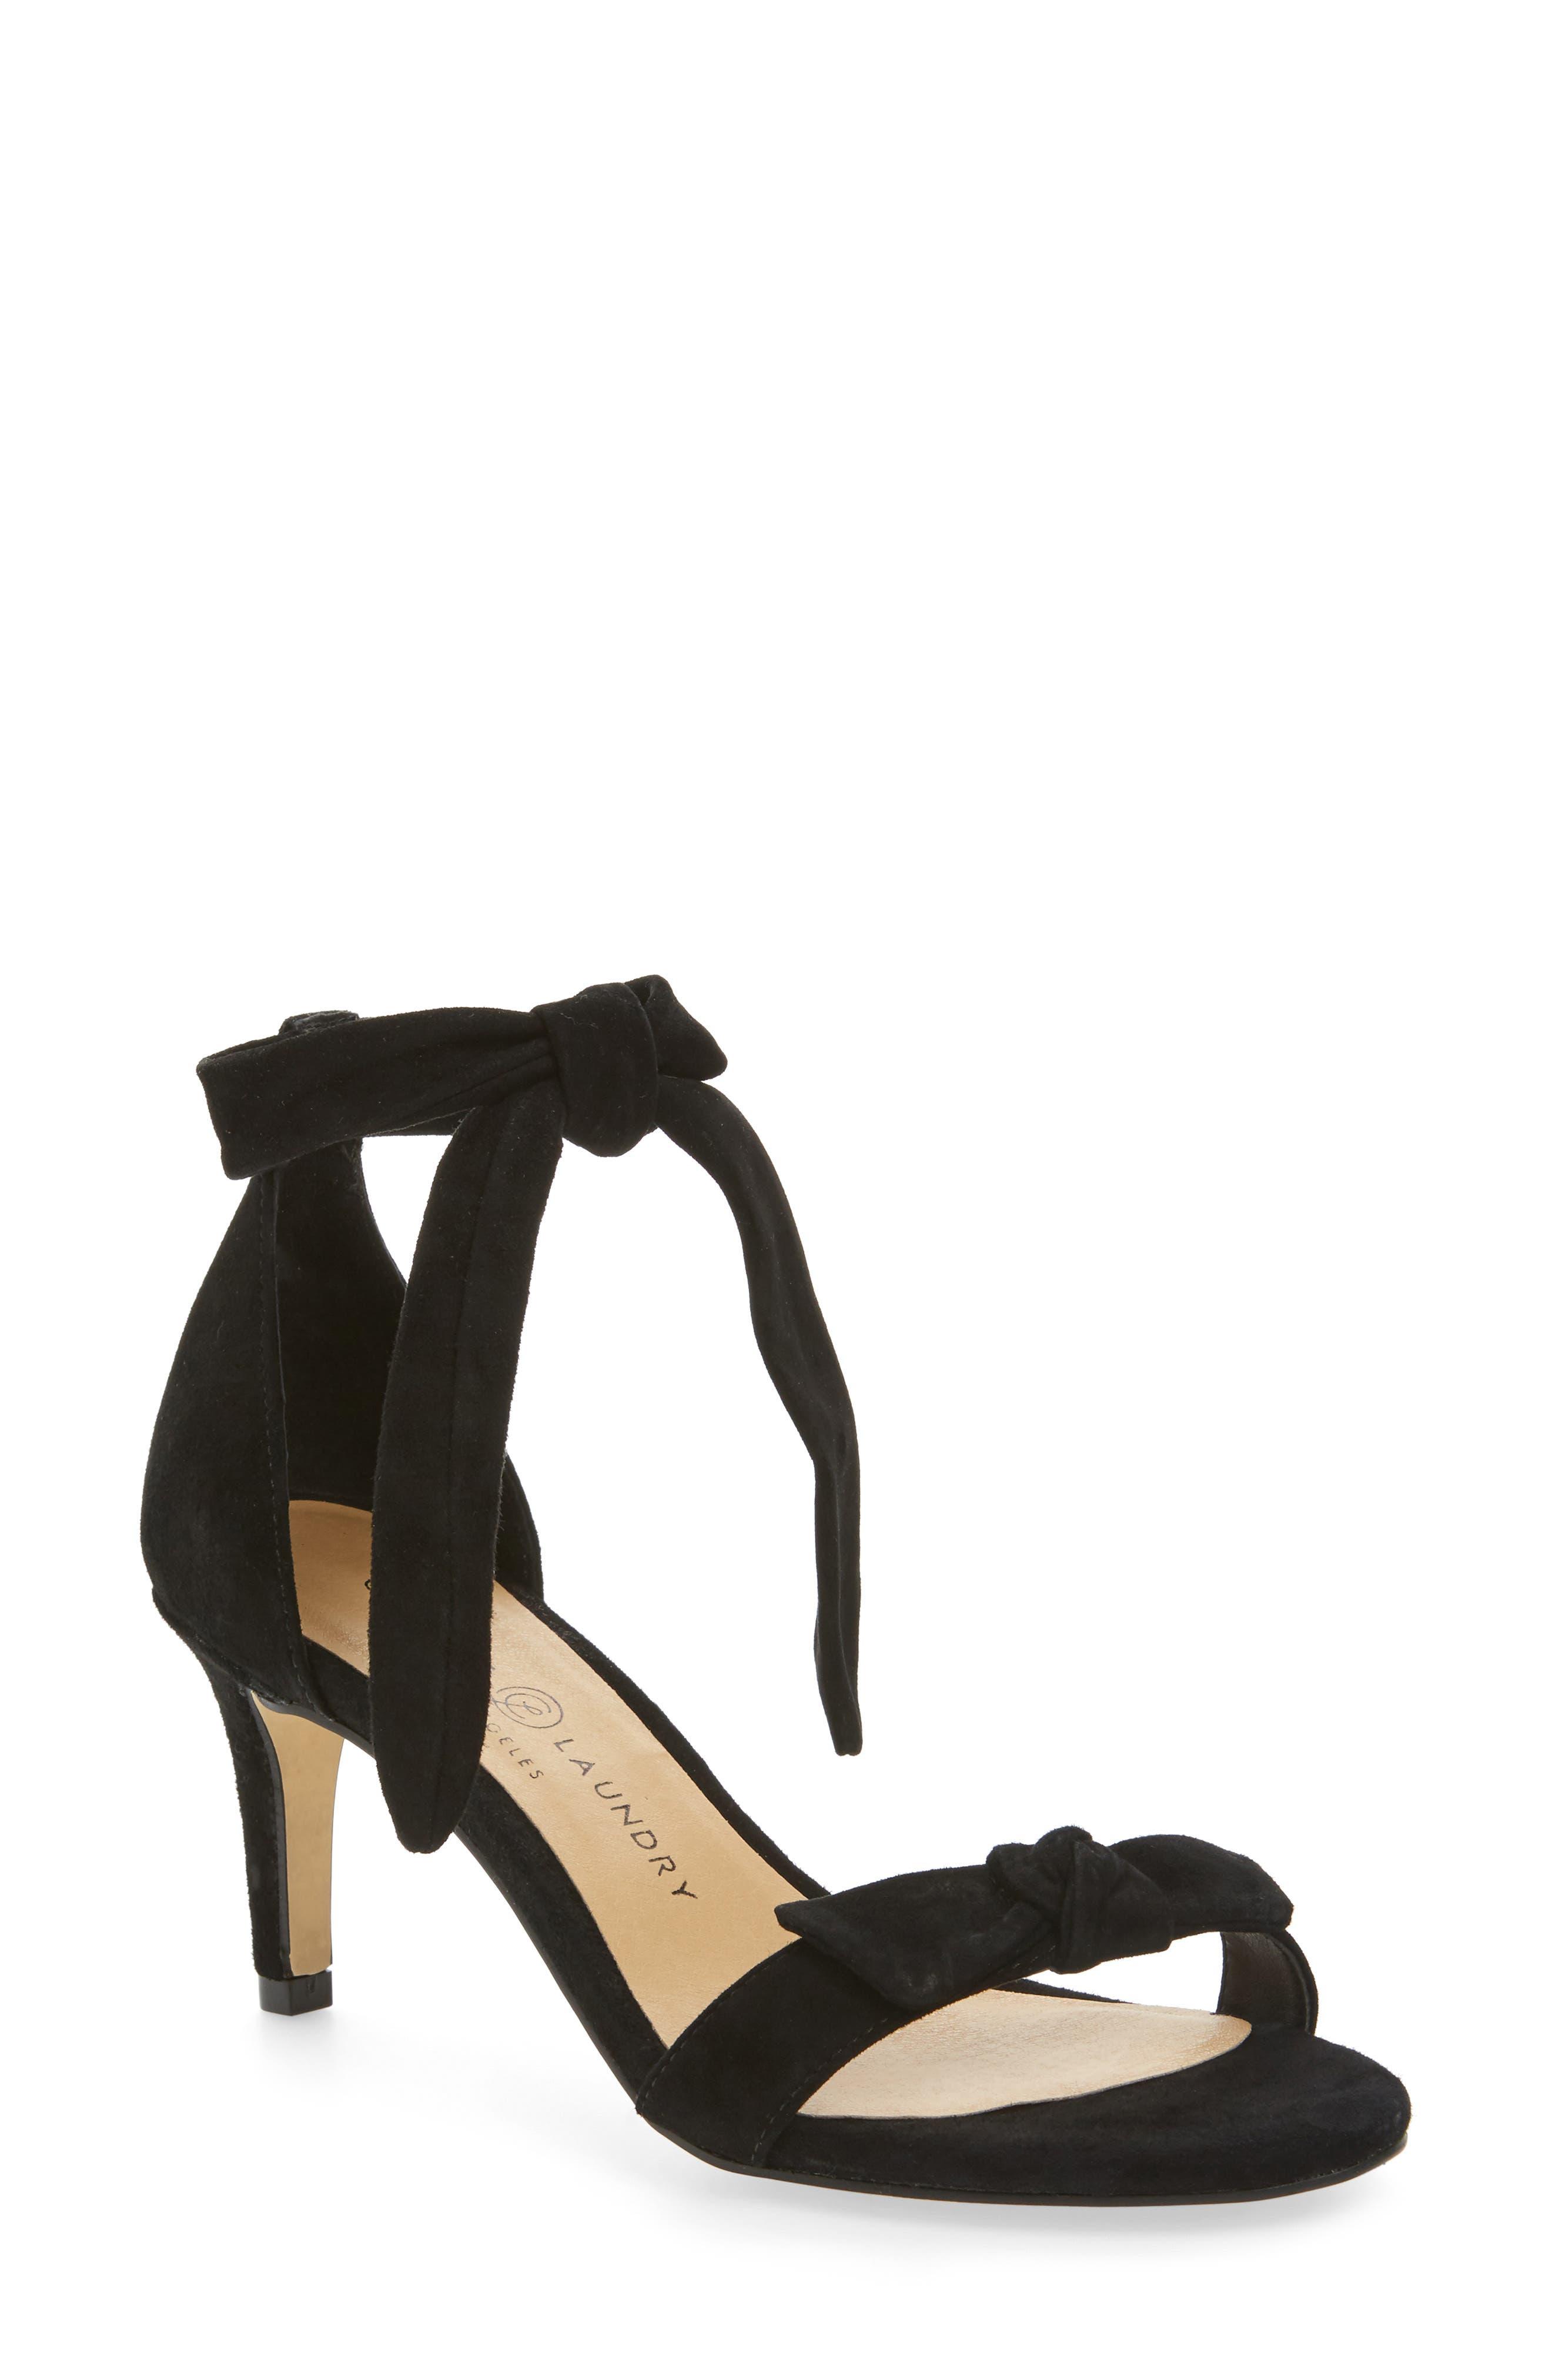 Rhonda Ankle Tie Sandal,                         Main,                         color, 001